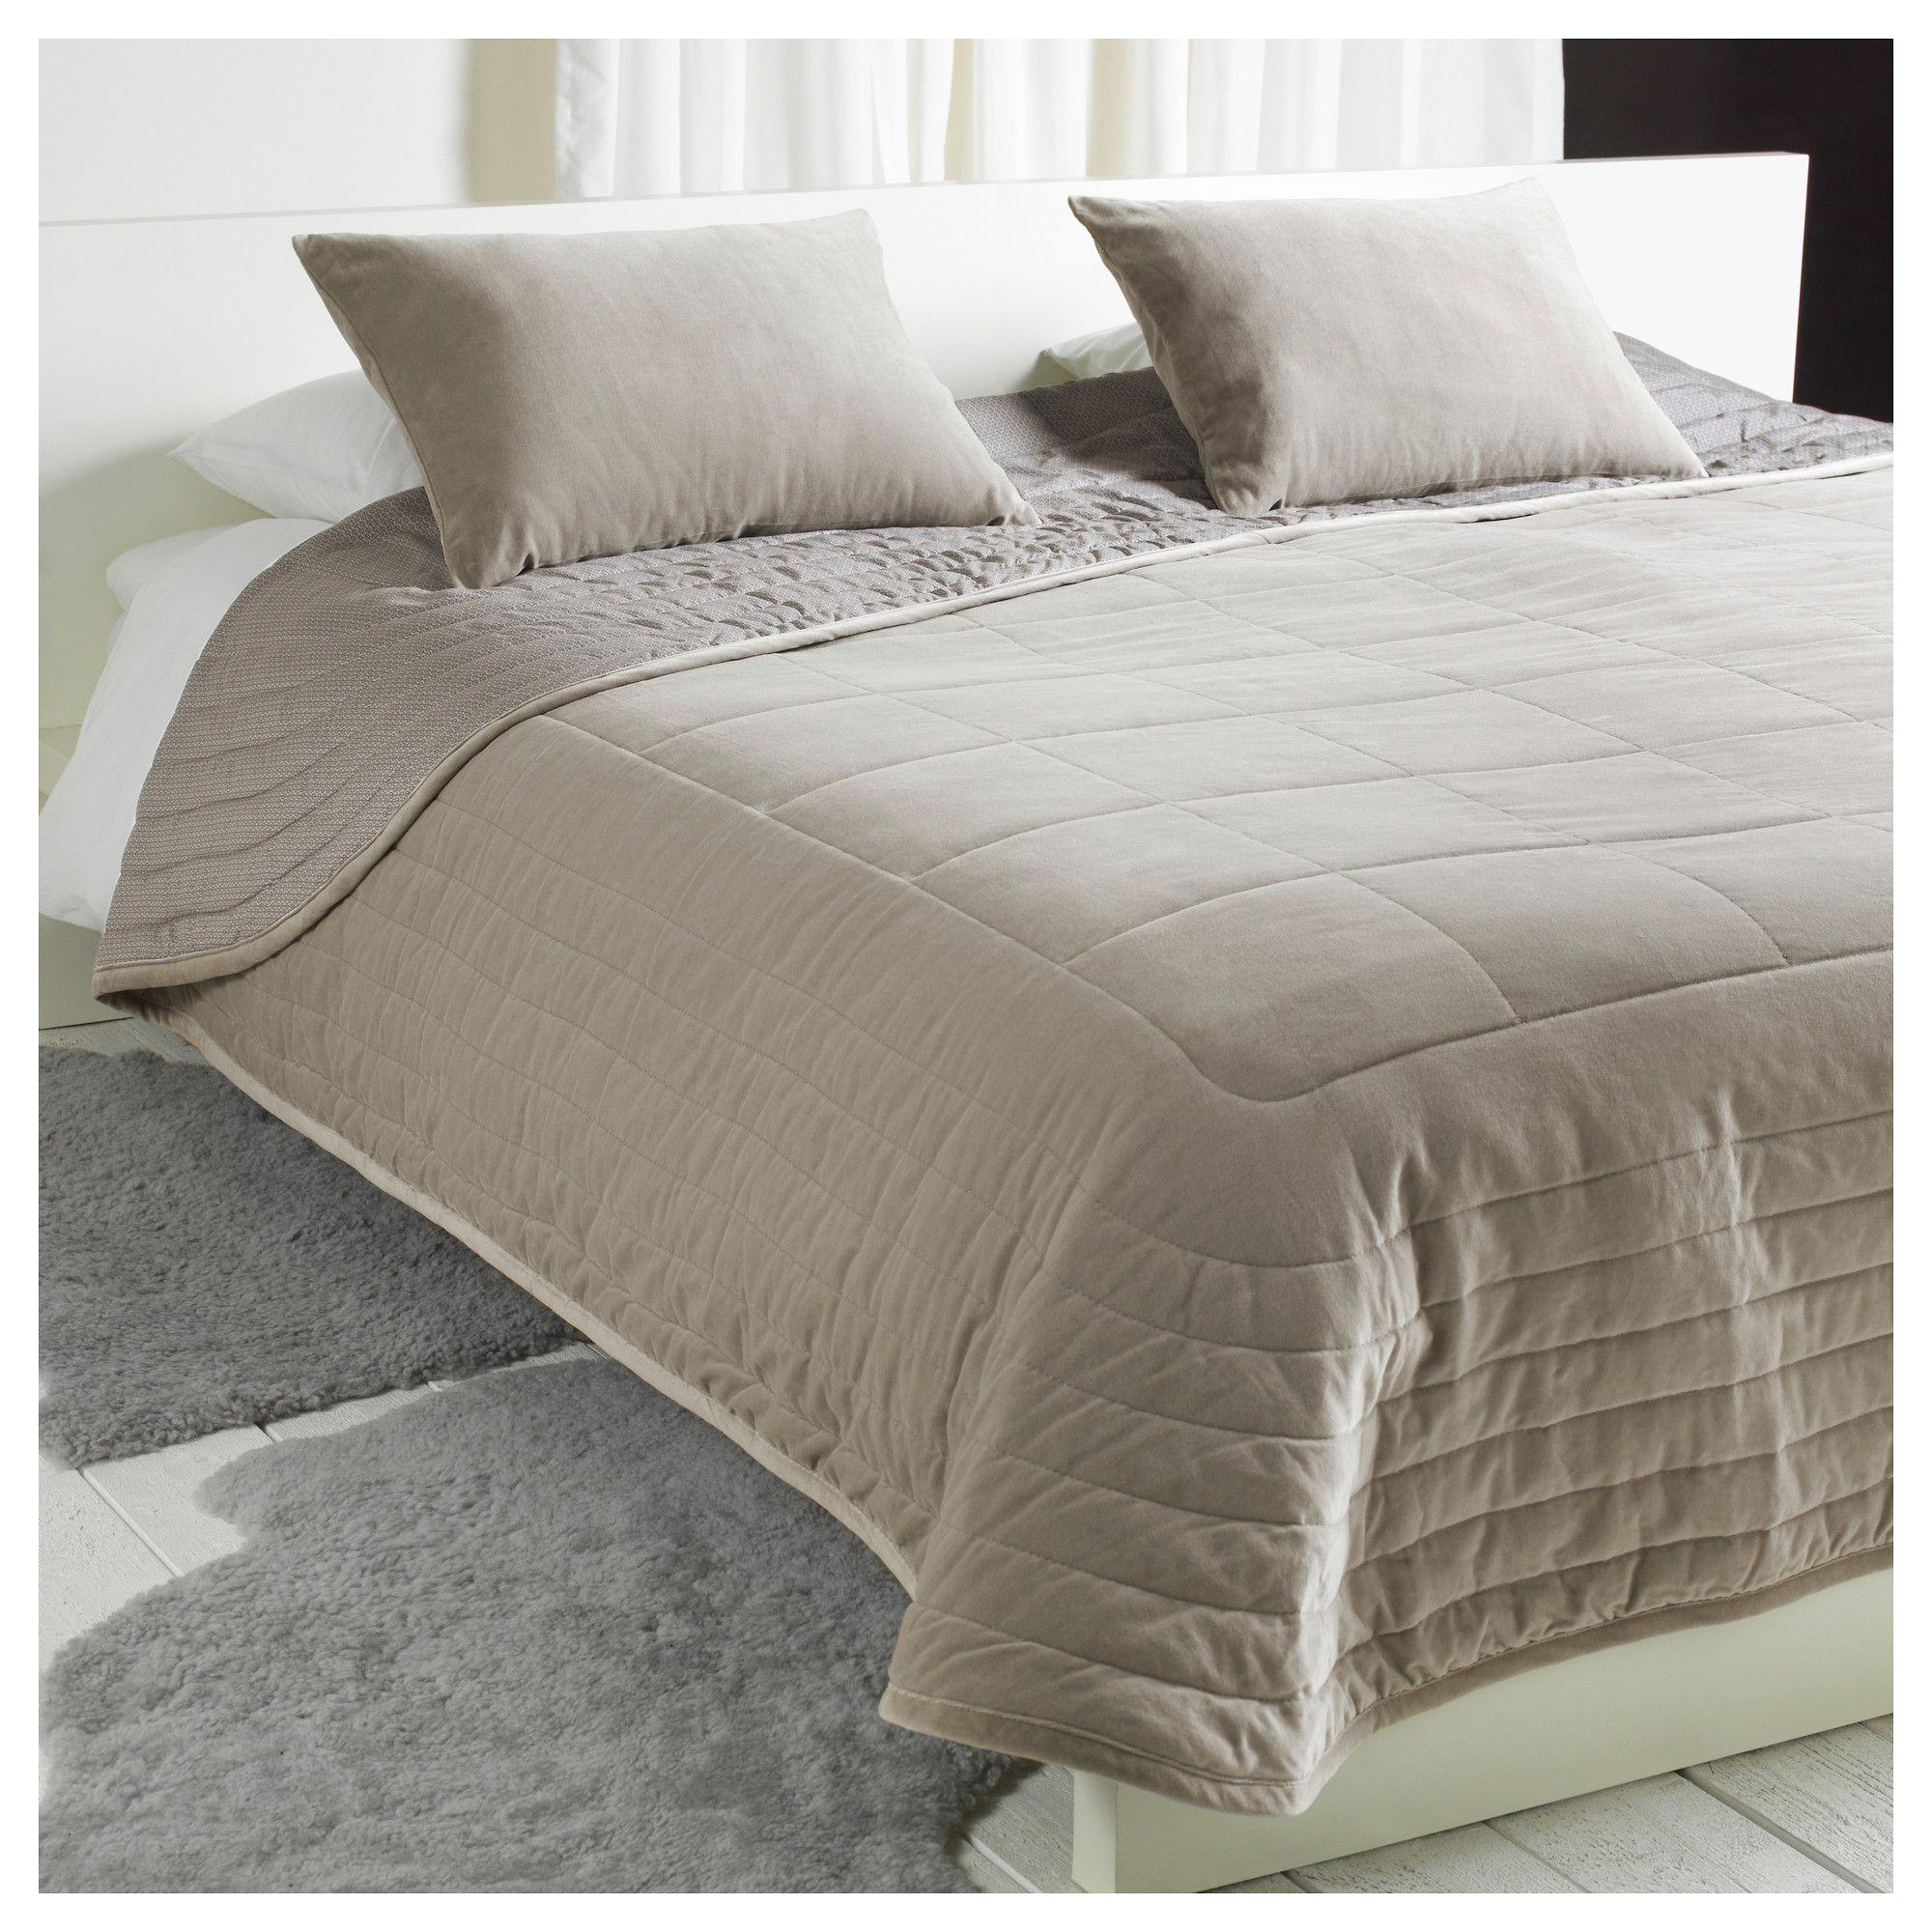 penningblad bedspread and 2 cushion covers ikea sr tr. Black Bedroom Furniture Sets. Home Design Ideas